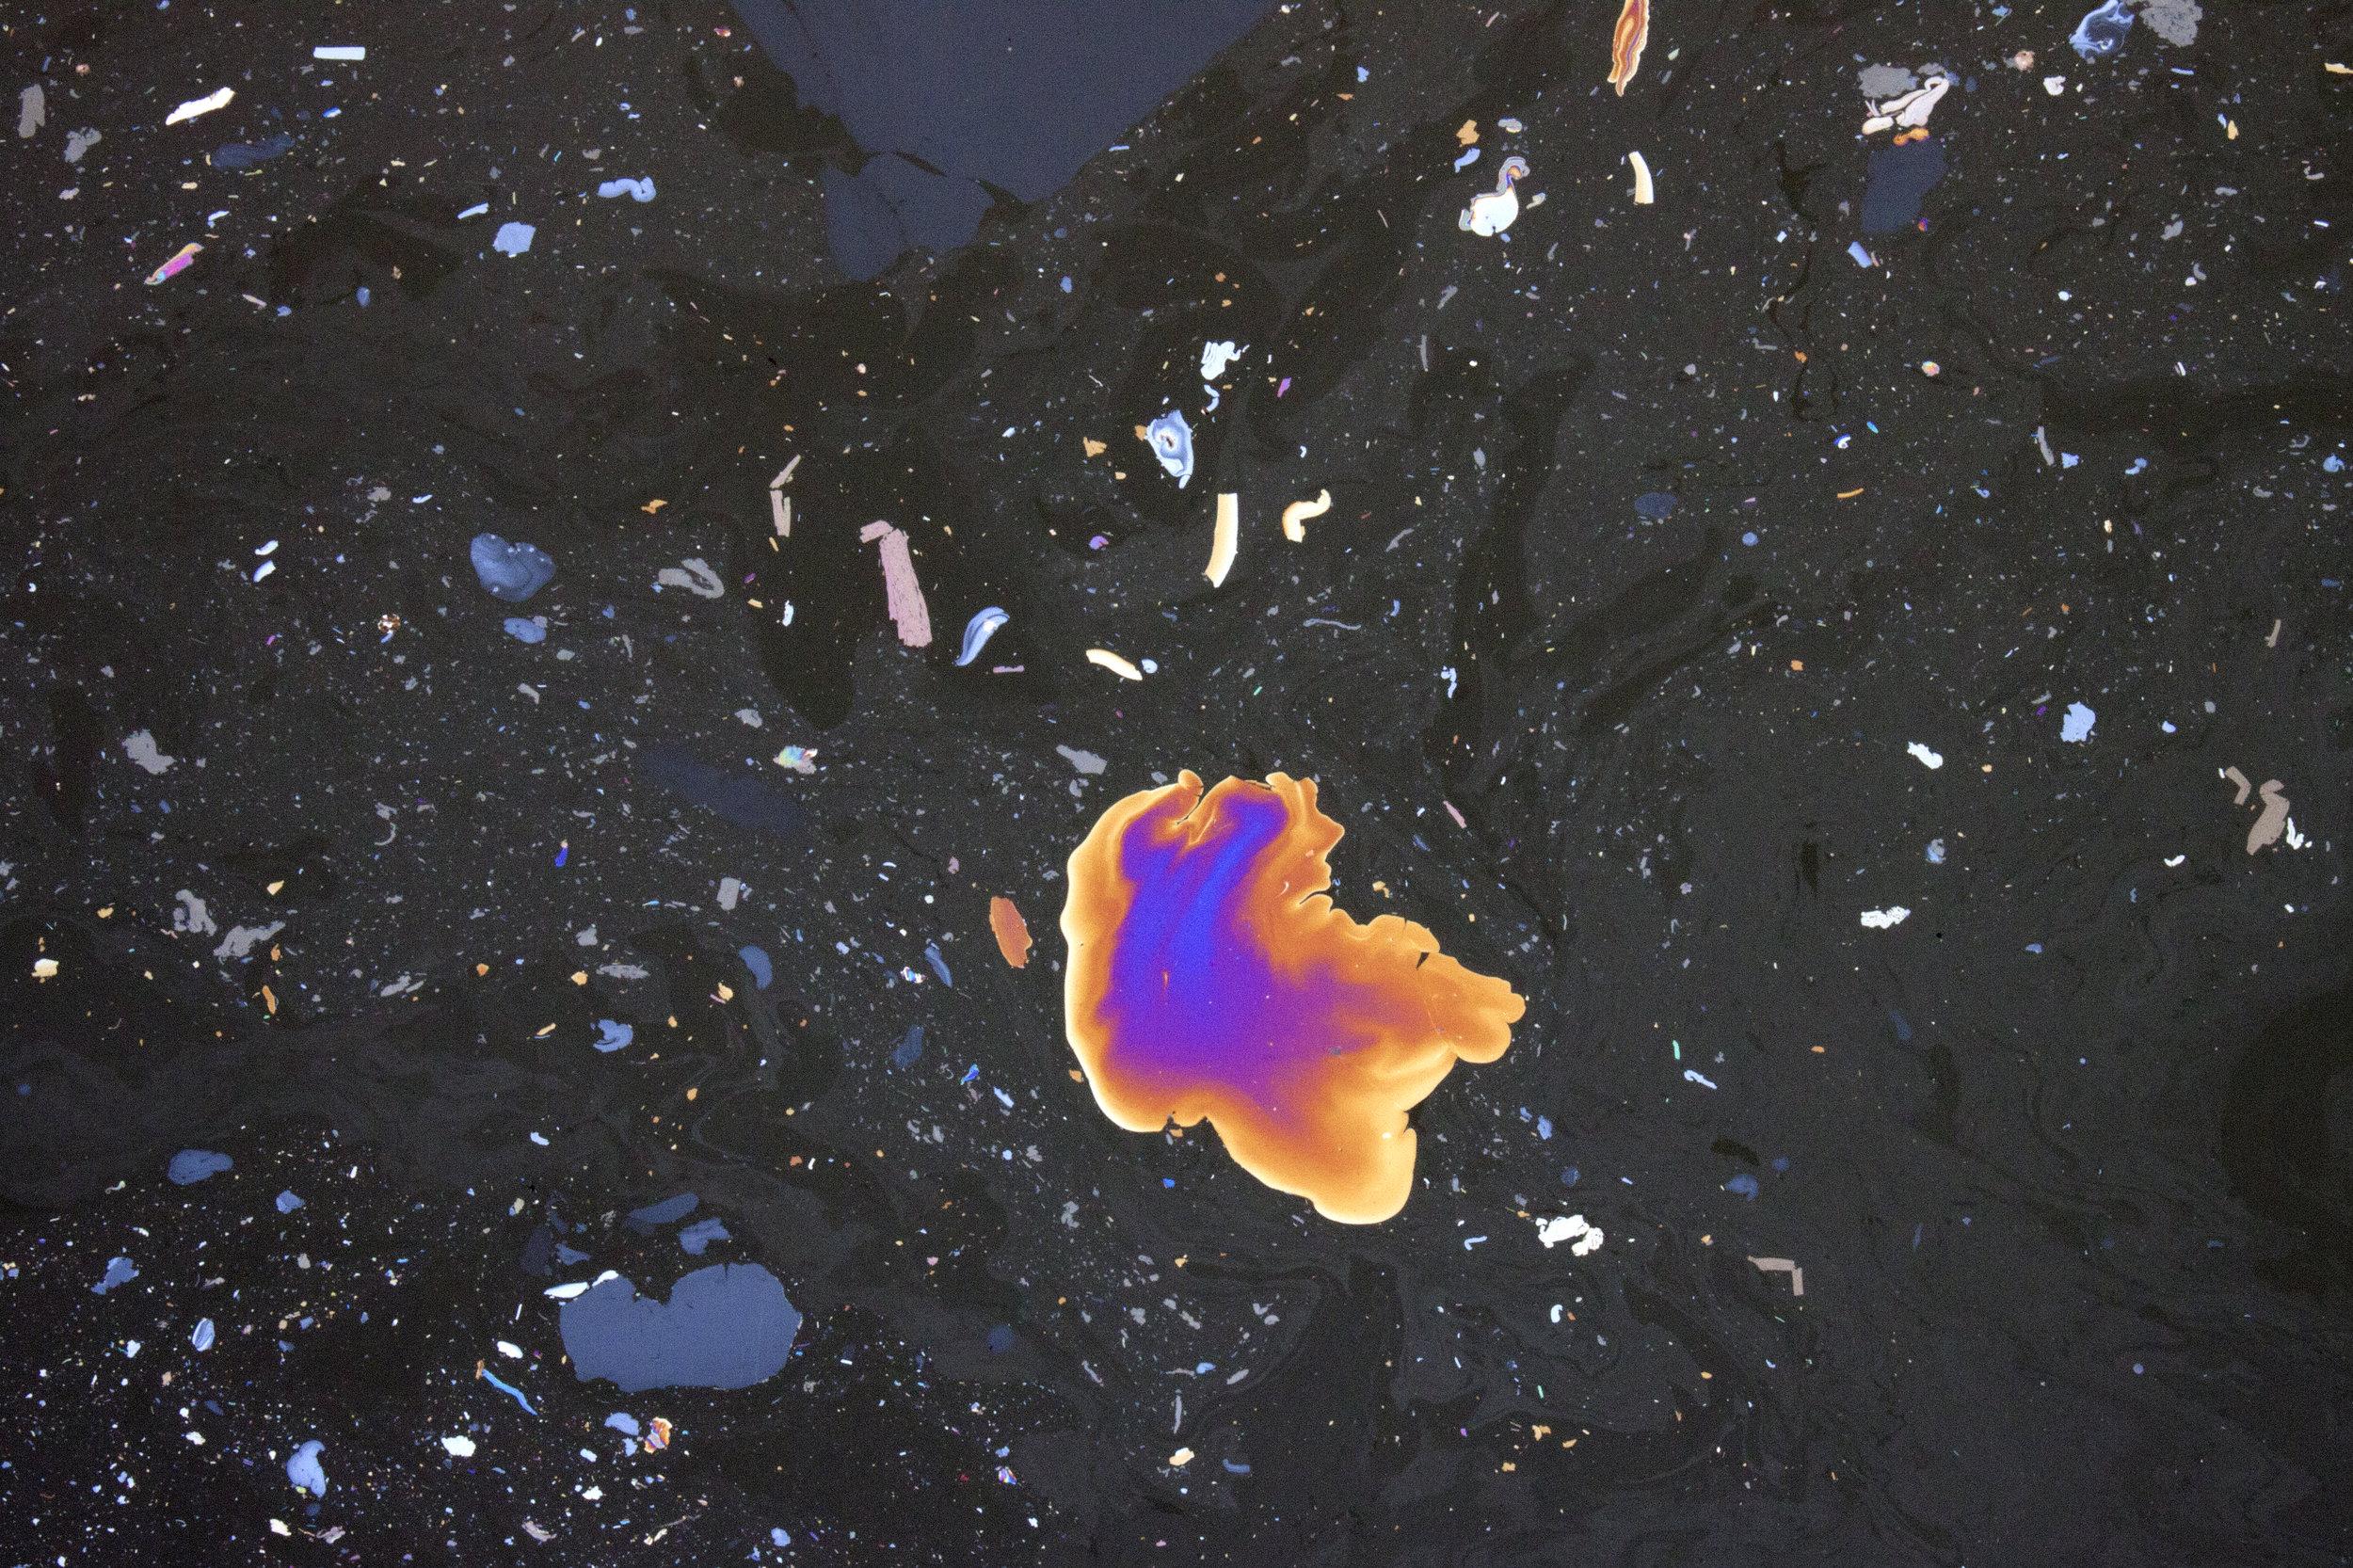 """Celestial Gowanus, #2"" 13x19"" Archival Pigment Print, 2016"